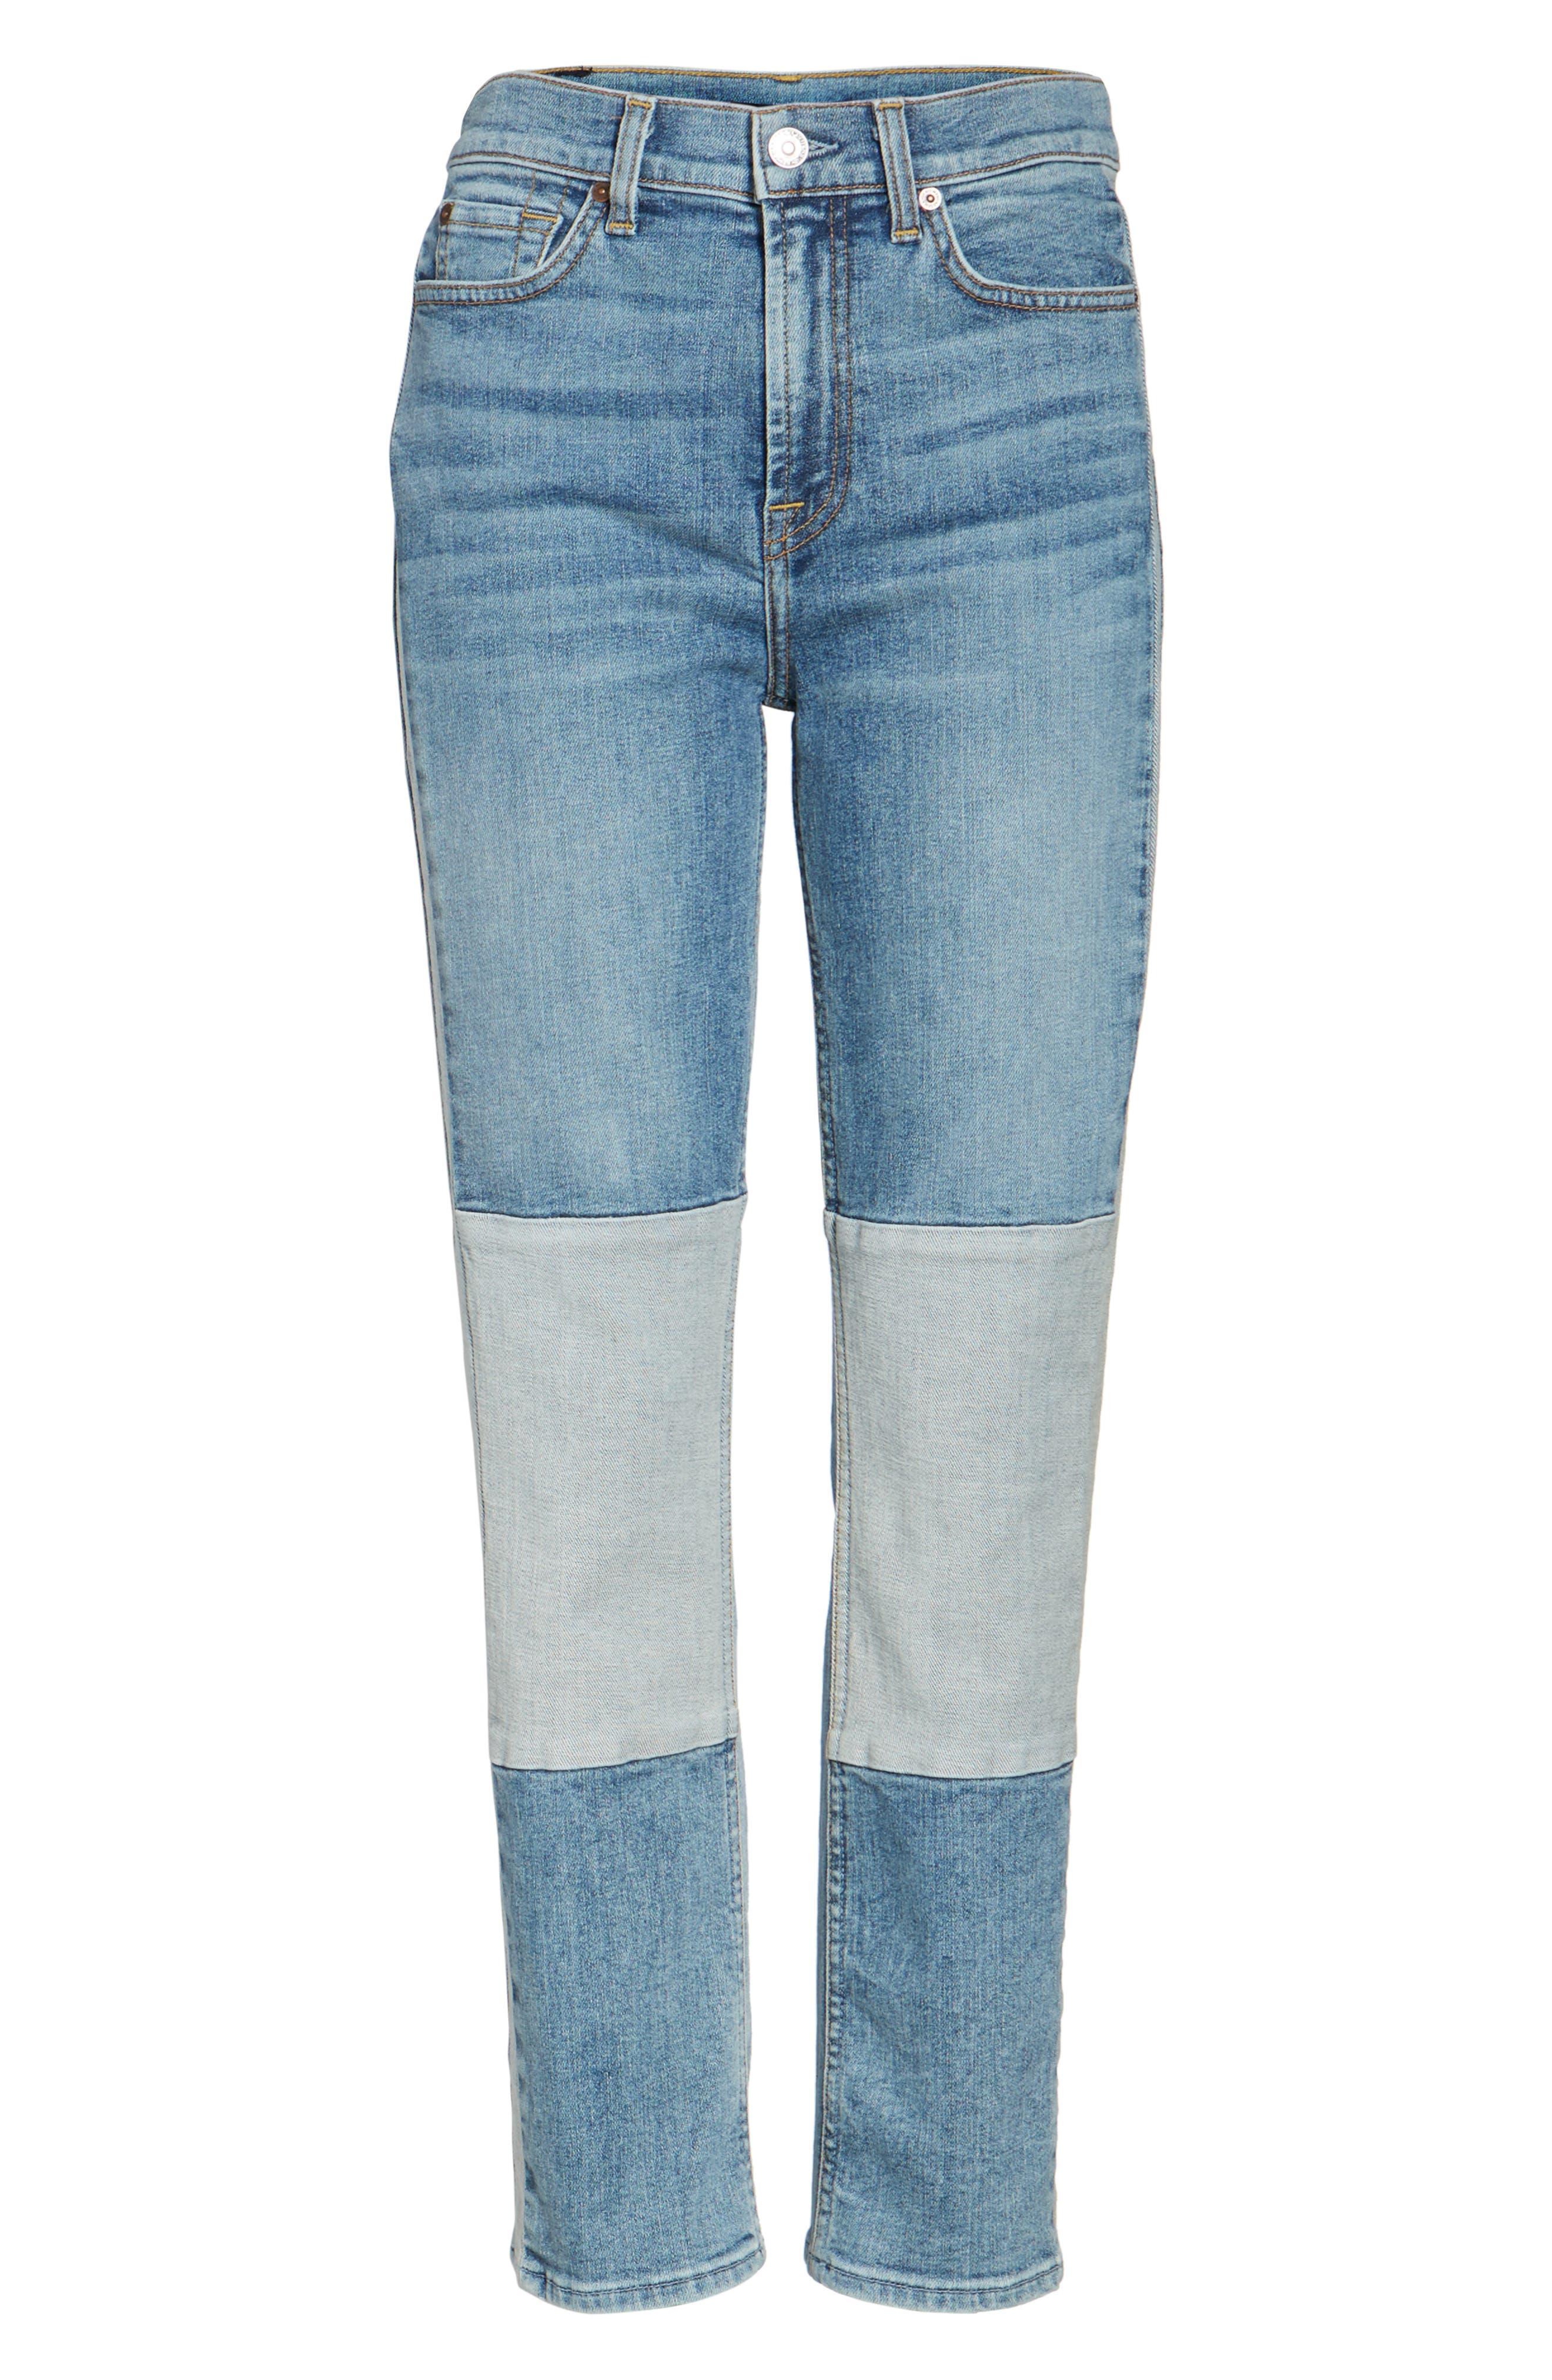 Edie High Waist Crop Jeans,                             Alternate thumbnail 6, color,                             400